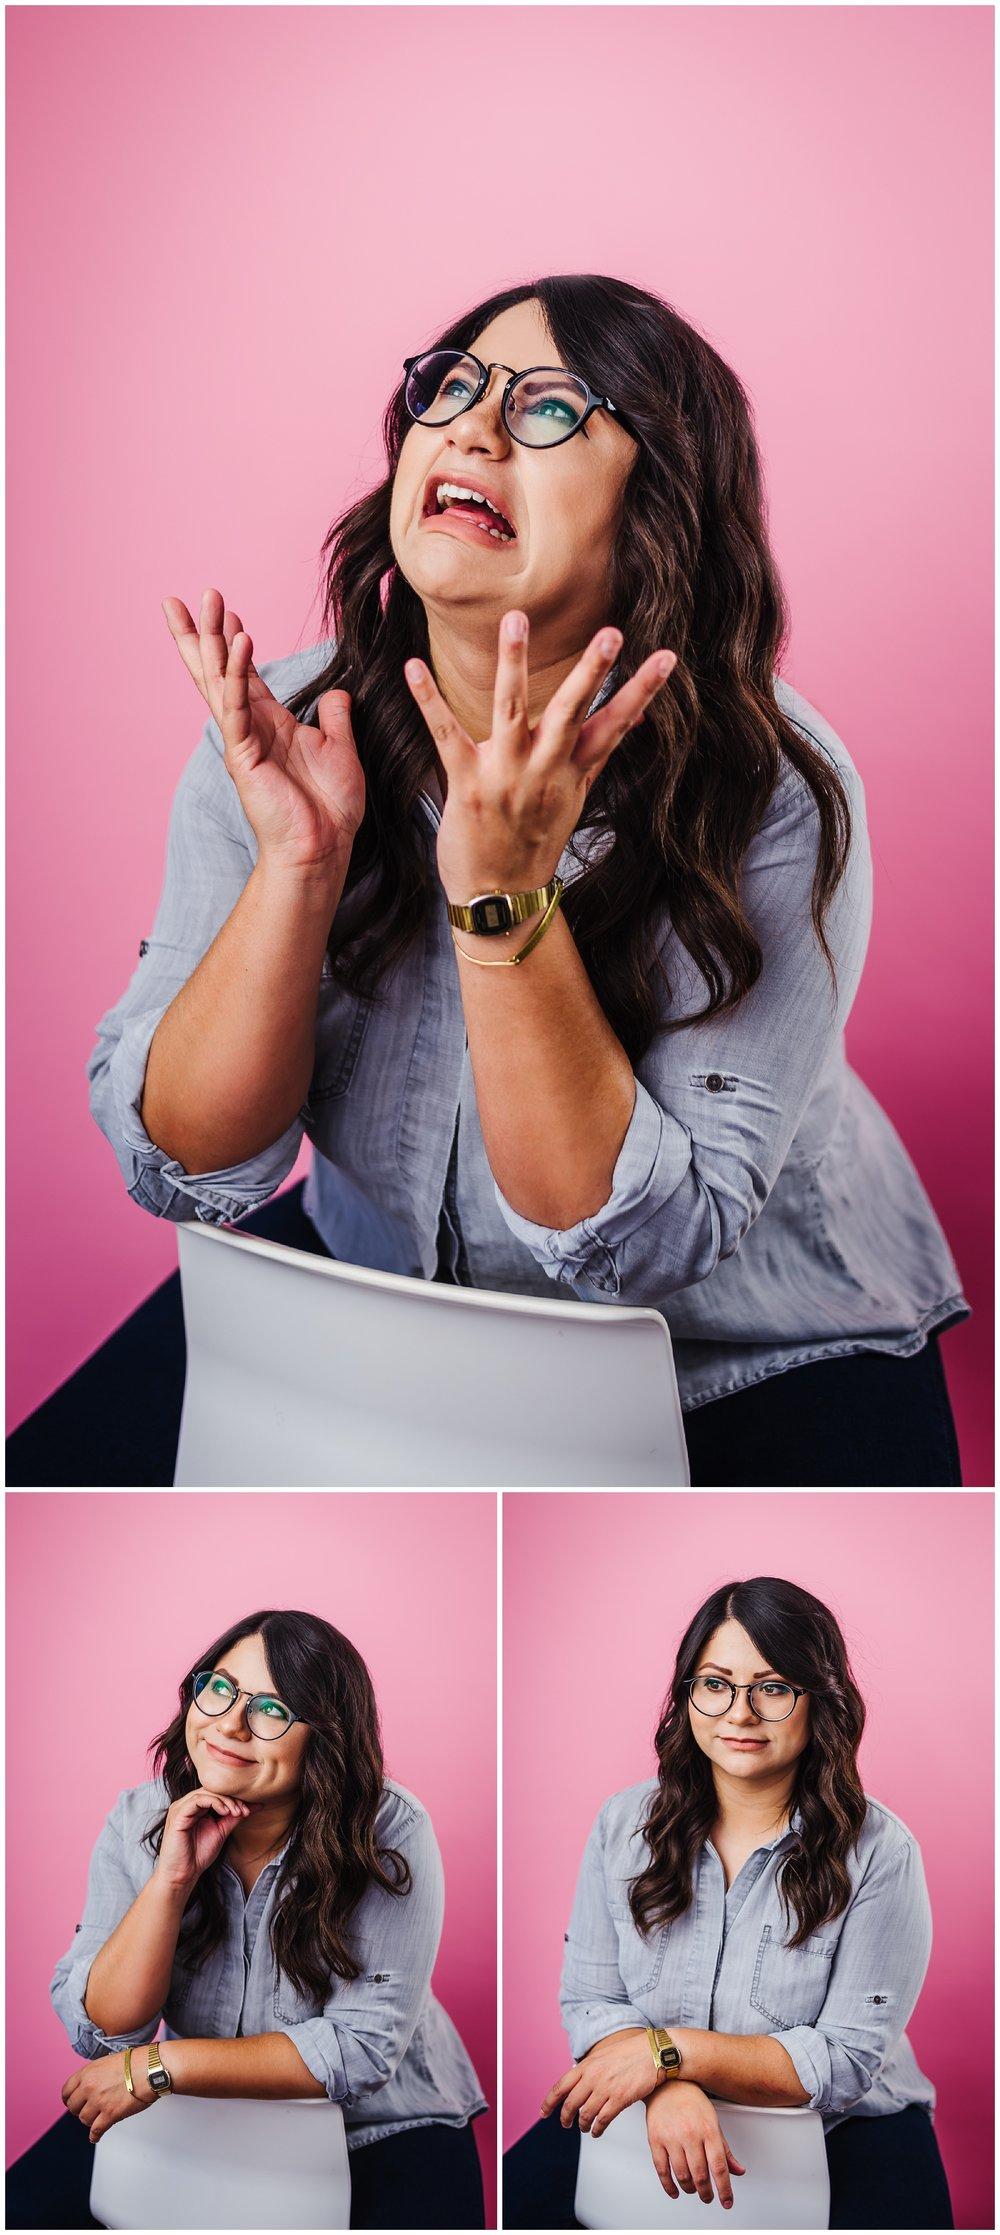 Tampa-portrait-photographer-pink-backdrop-glasses-nerd-expressive_0114.jpg